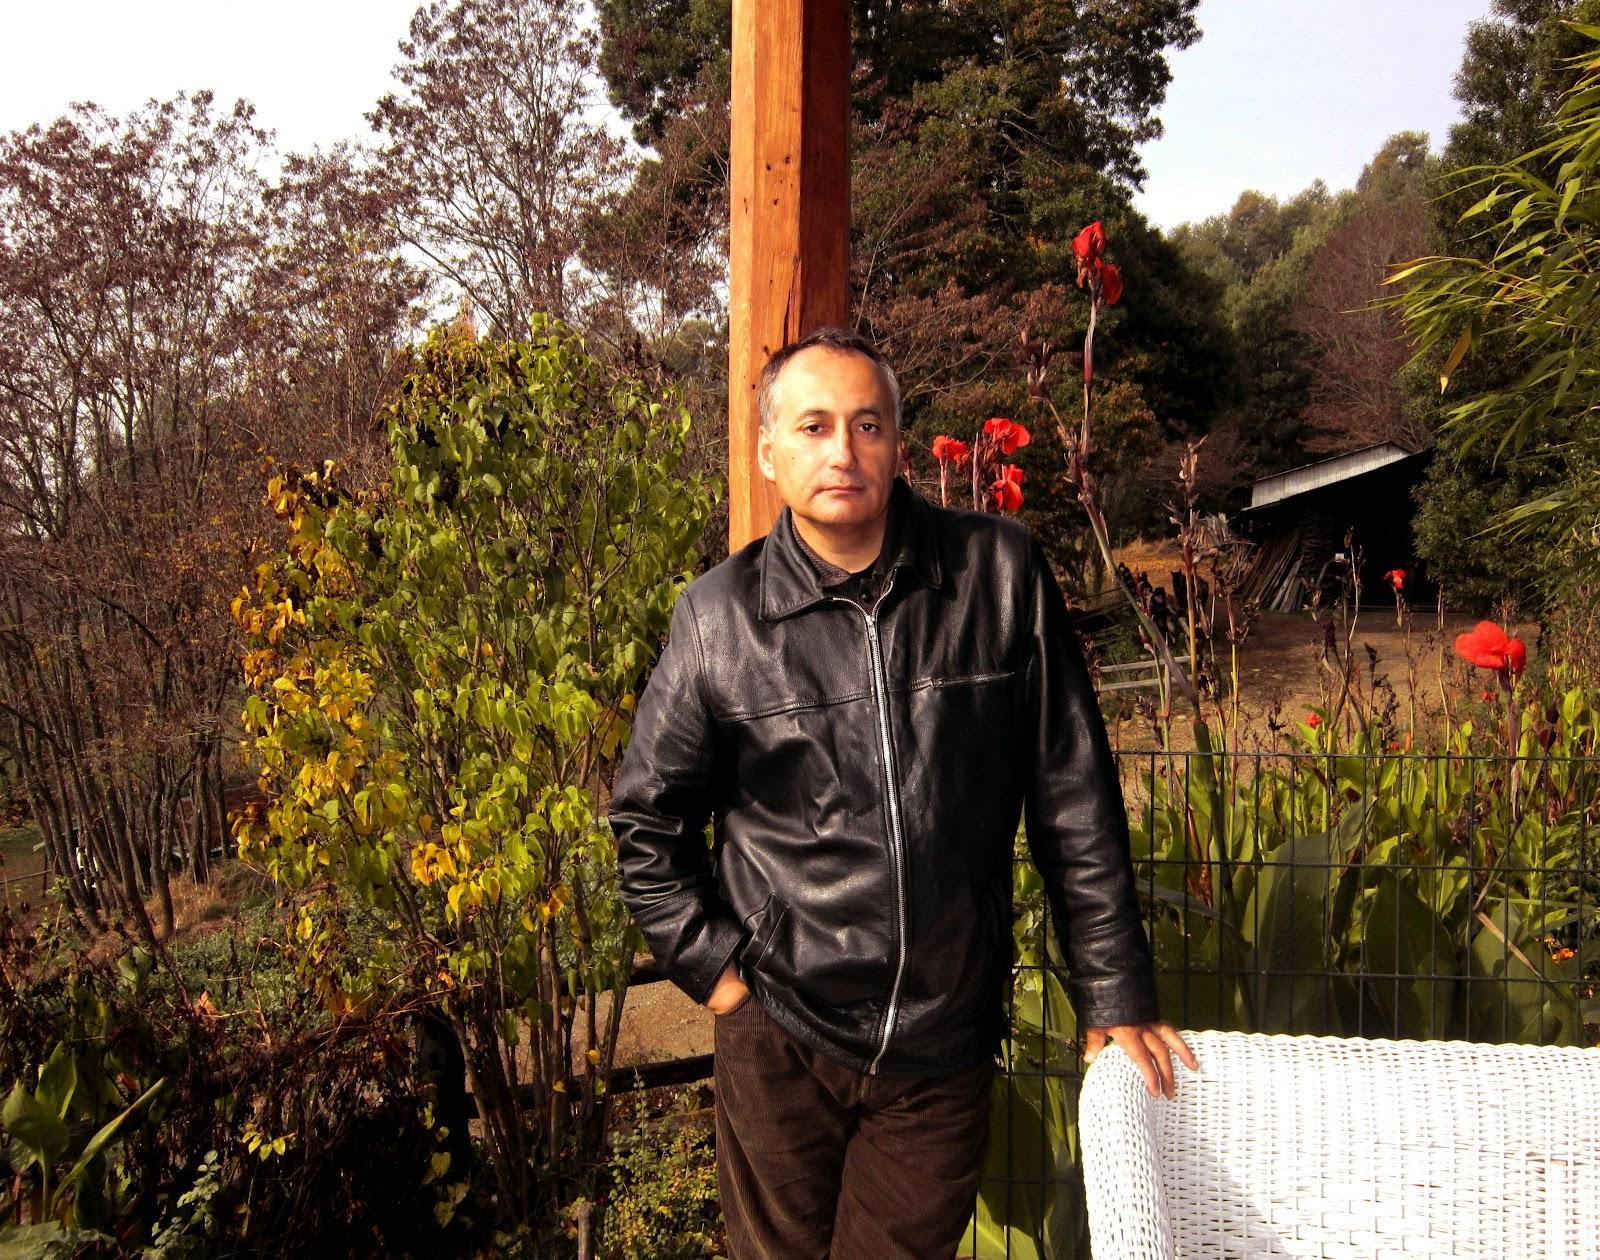 https://i0.wp.com/2.bp.blogspot.com/-dmudg5RiqTY/UAHZFhWkWEI/AAAAAAAAFig/A74Ia7RvXPY/s1600/Adolfo+Vasquez+Rocca+_+Los+Angeles+_+Sur+_+2012+_+1++C.jpeg